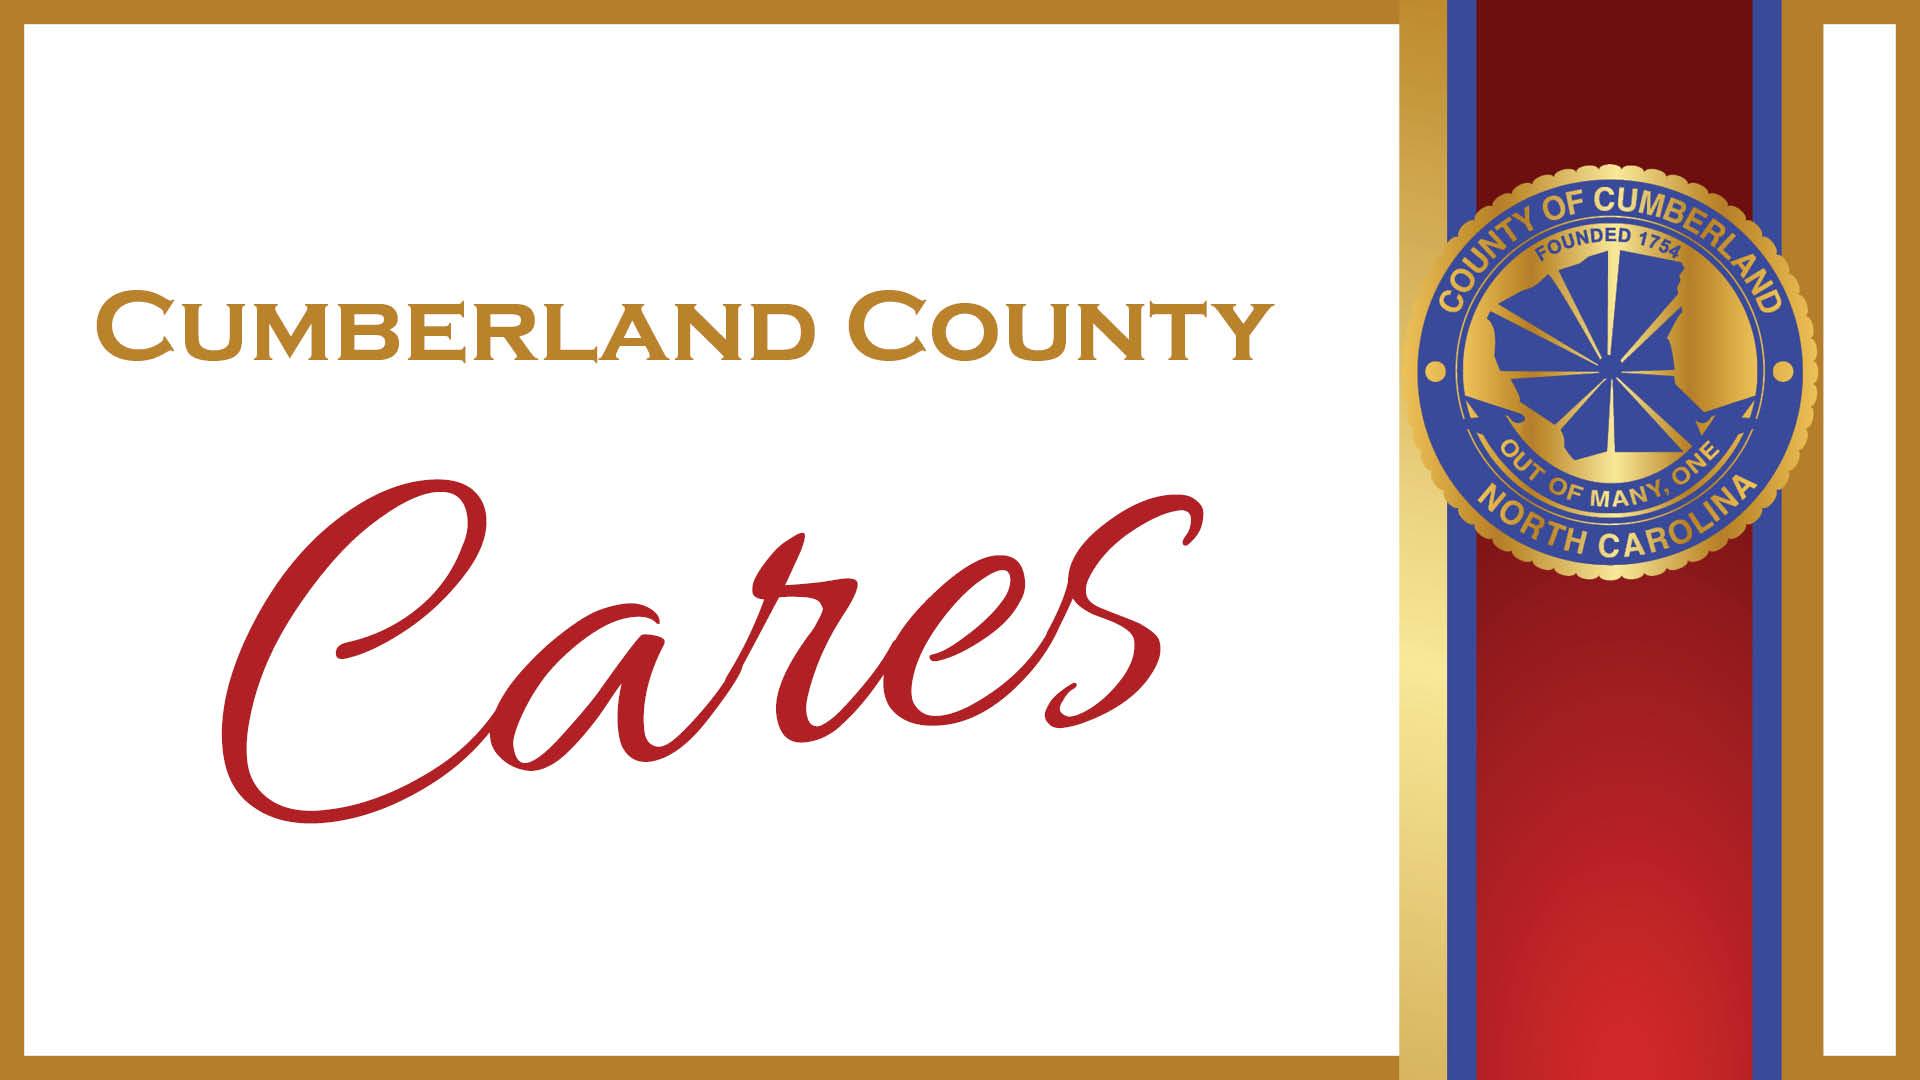 Cumberland County Cares